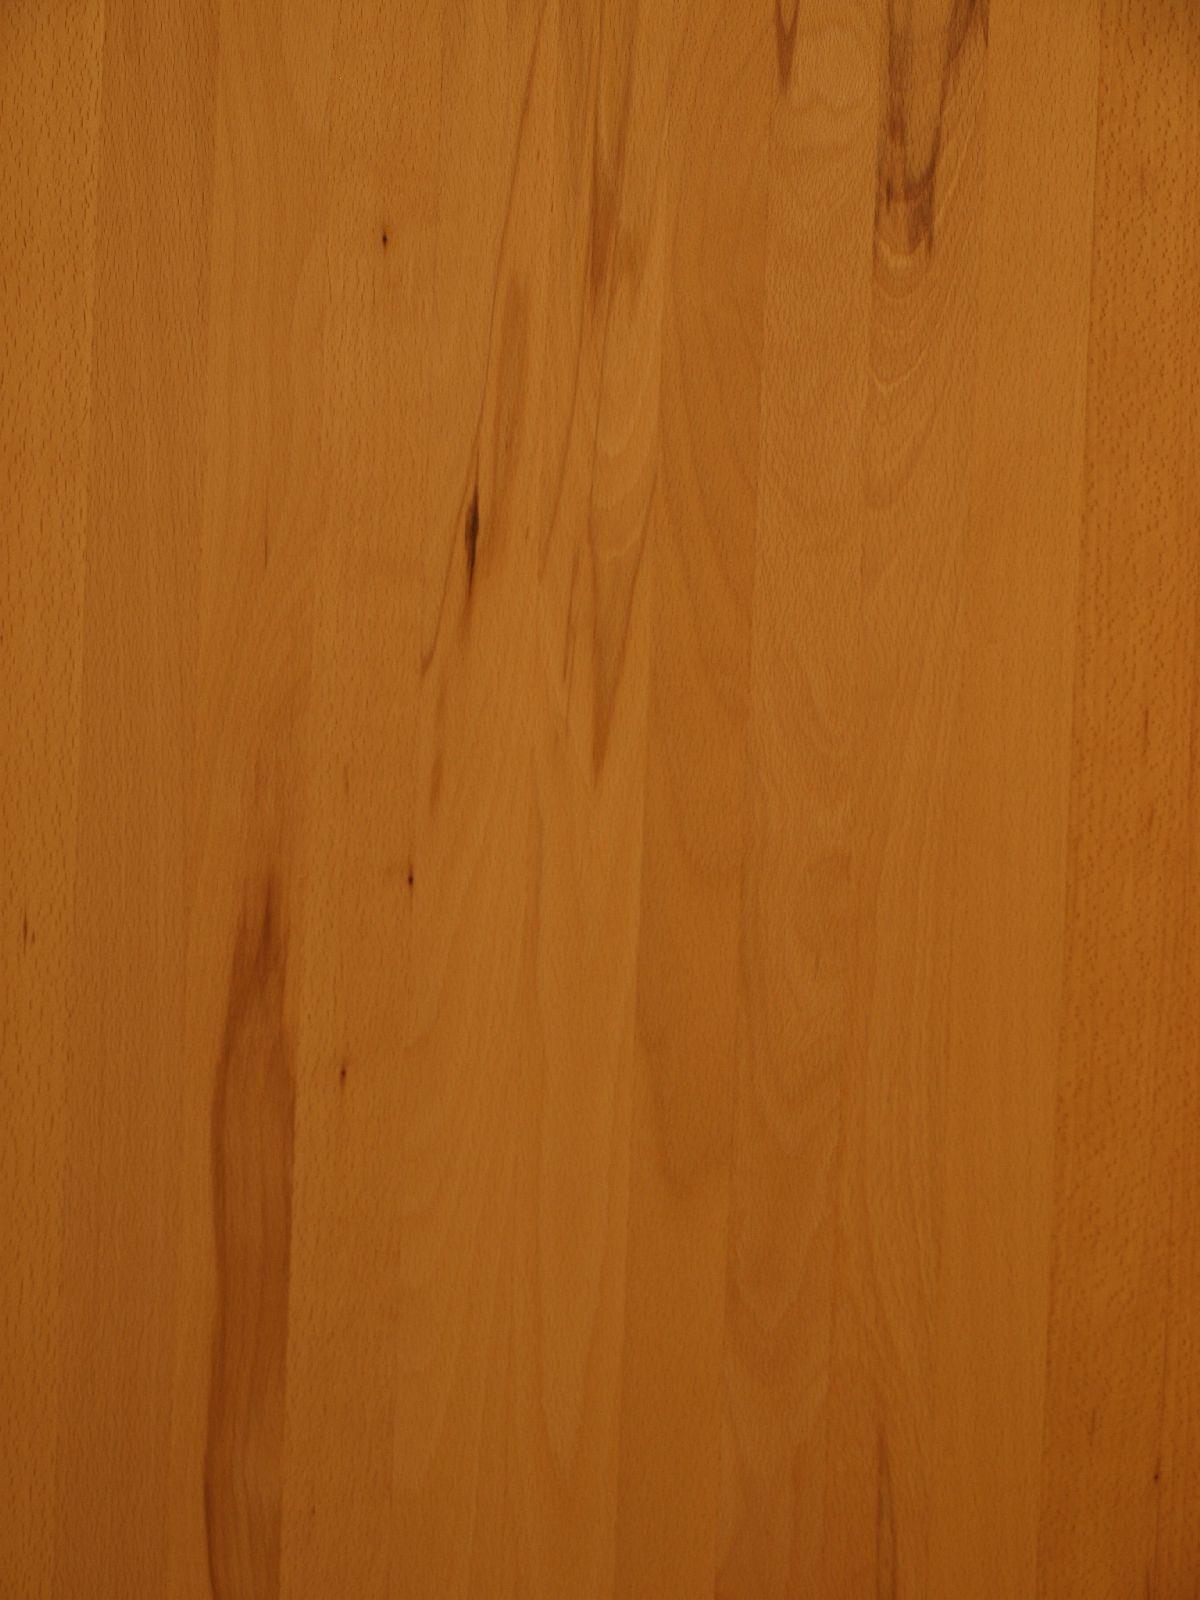 Wood_Texture_A_P9269828